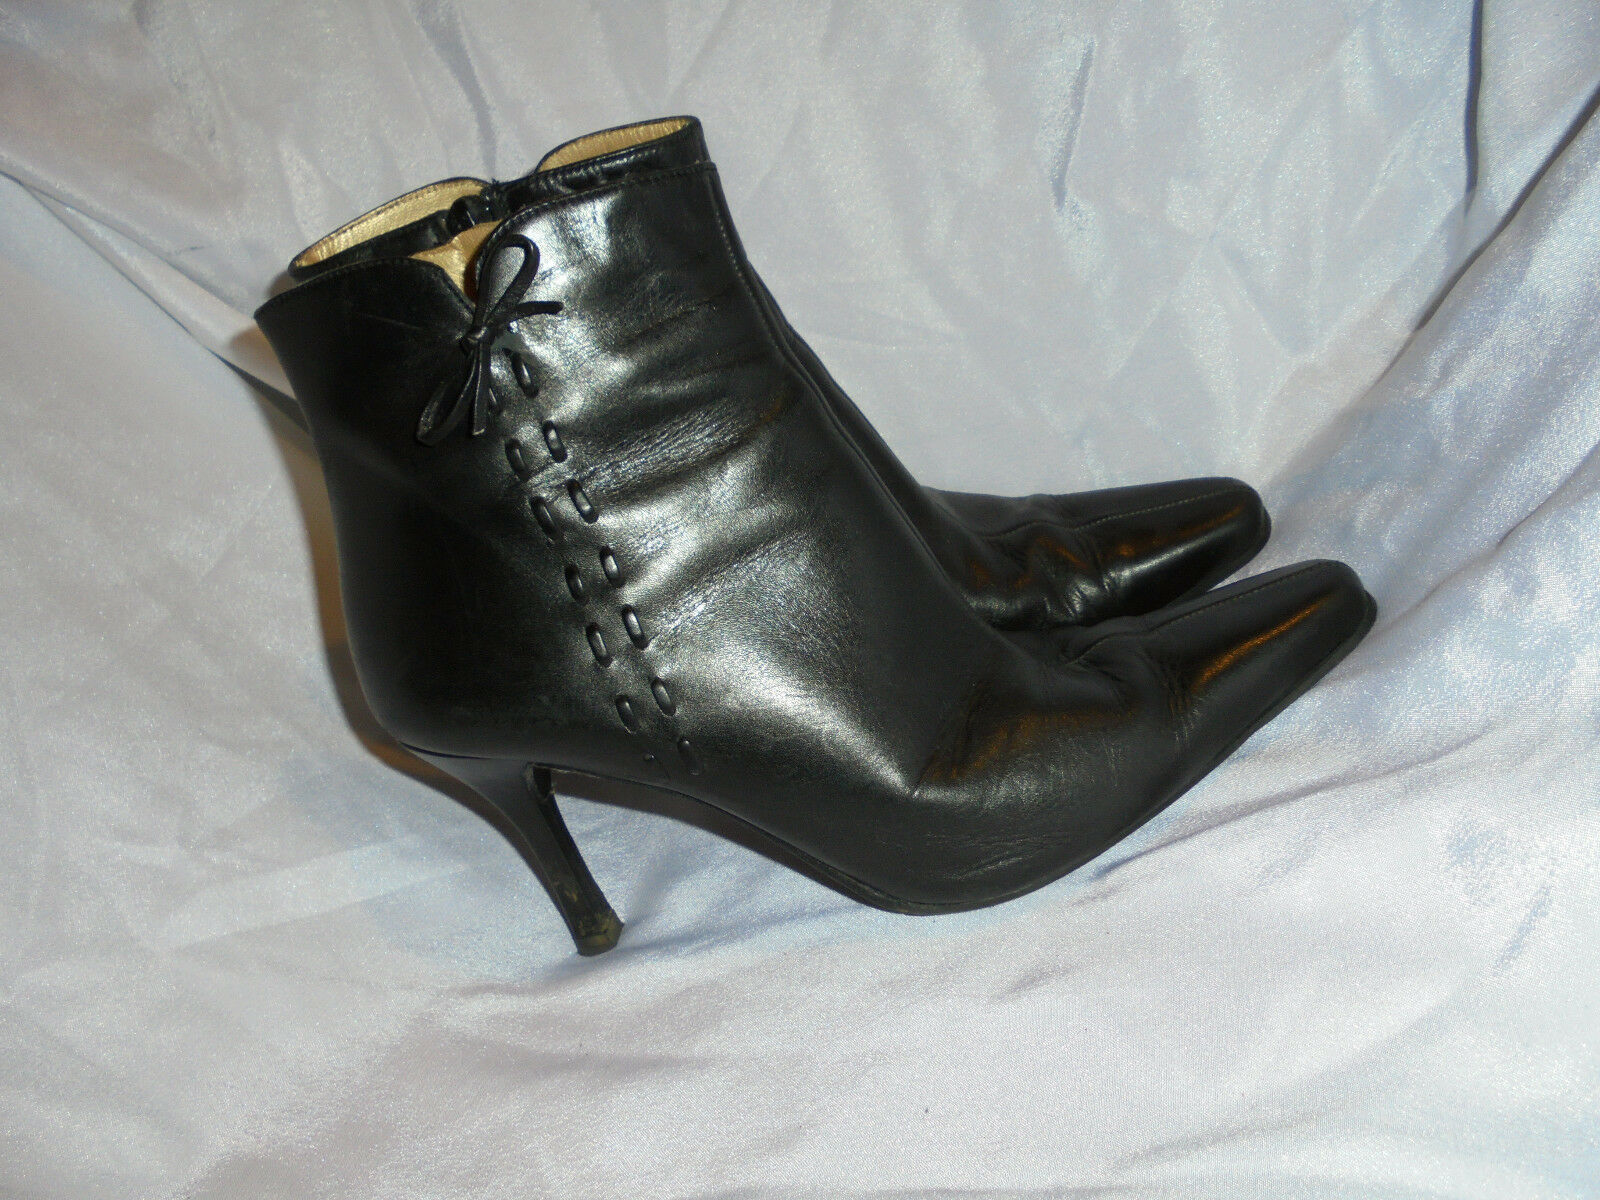 AZUREE WOMEN'S 6 BLACK LEATHER ZIP ANKLE Stiefel SIZE UK 6 WOMEN'S EU 39 VGC 754f43